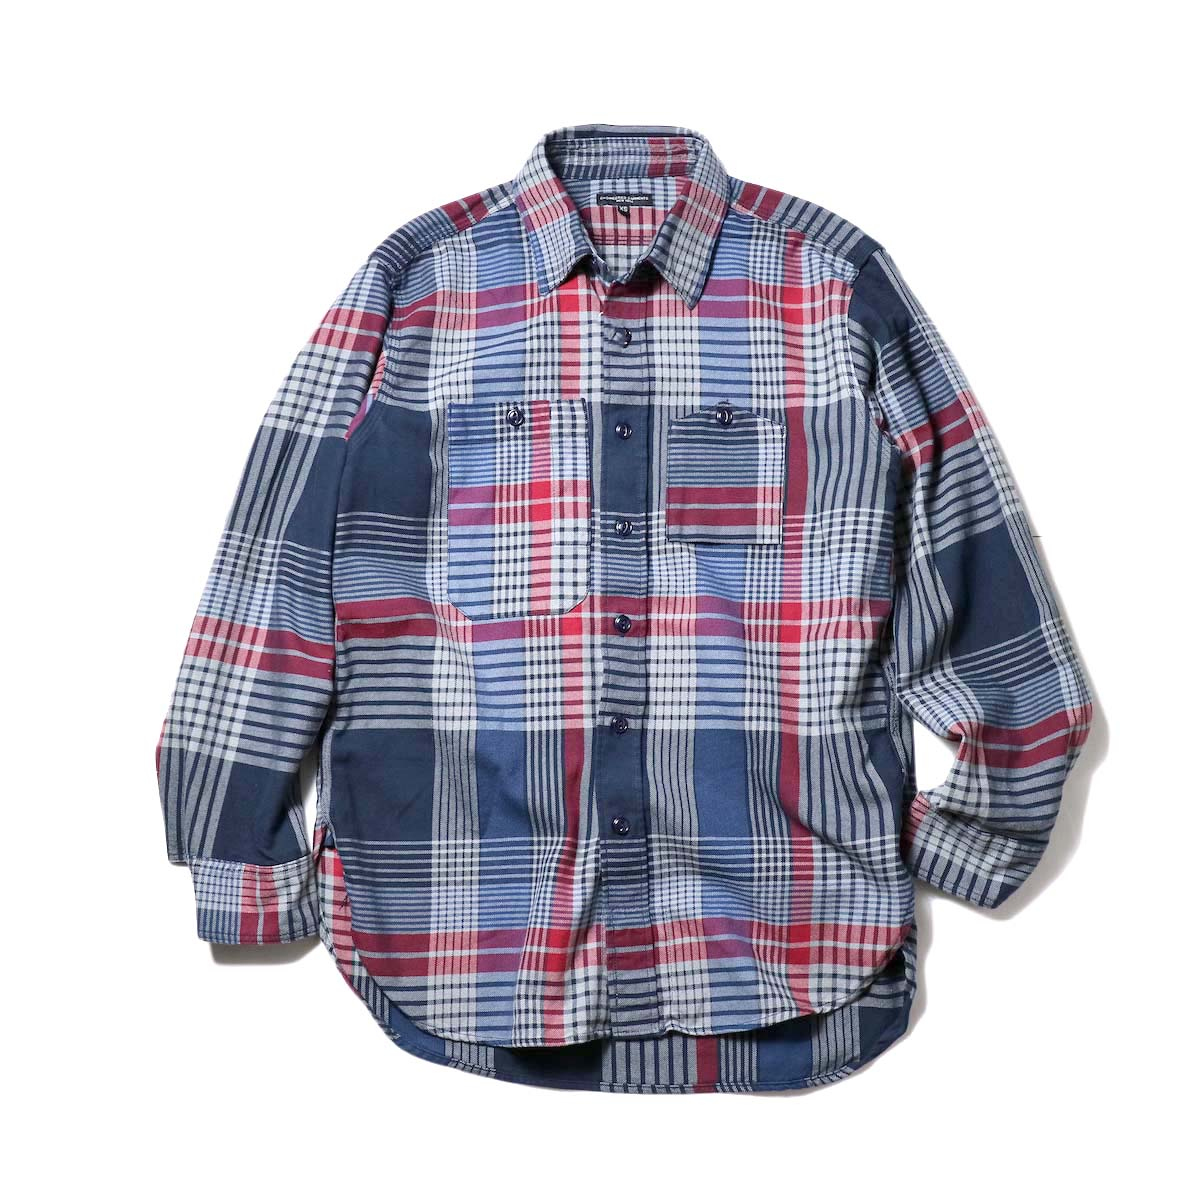 Engineered Garments / Work Shirt-Twill Plaid (Navy/Gray/Red)